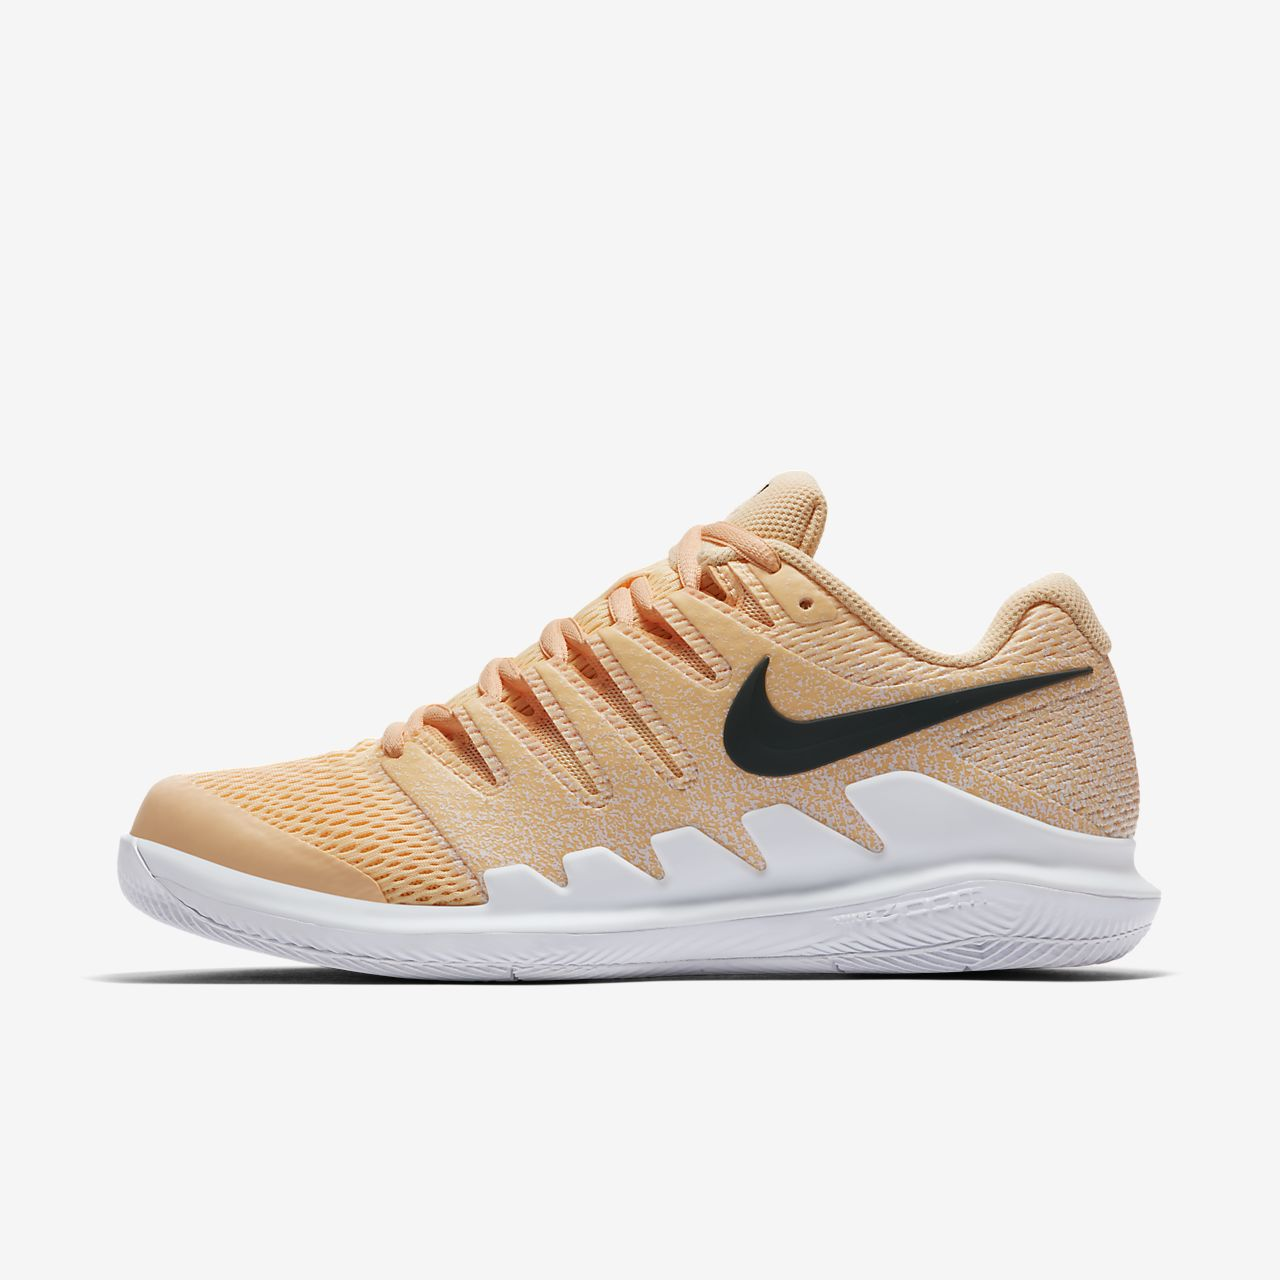 Nike NikeCourt Air Zoom Vapor X Hard Court Women s Tennis Shoe at ... d37906f72